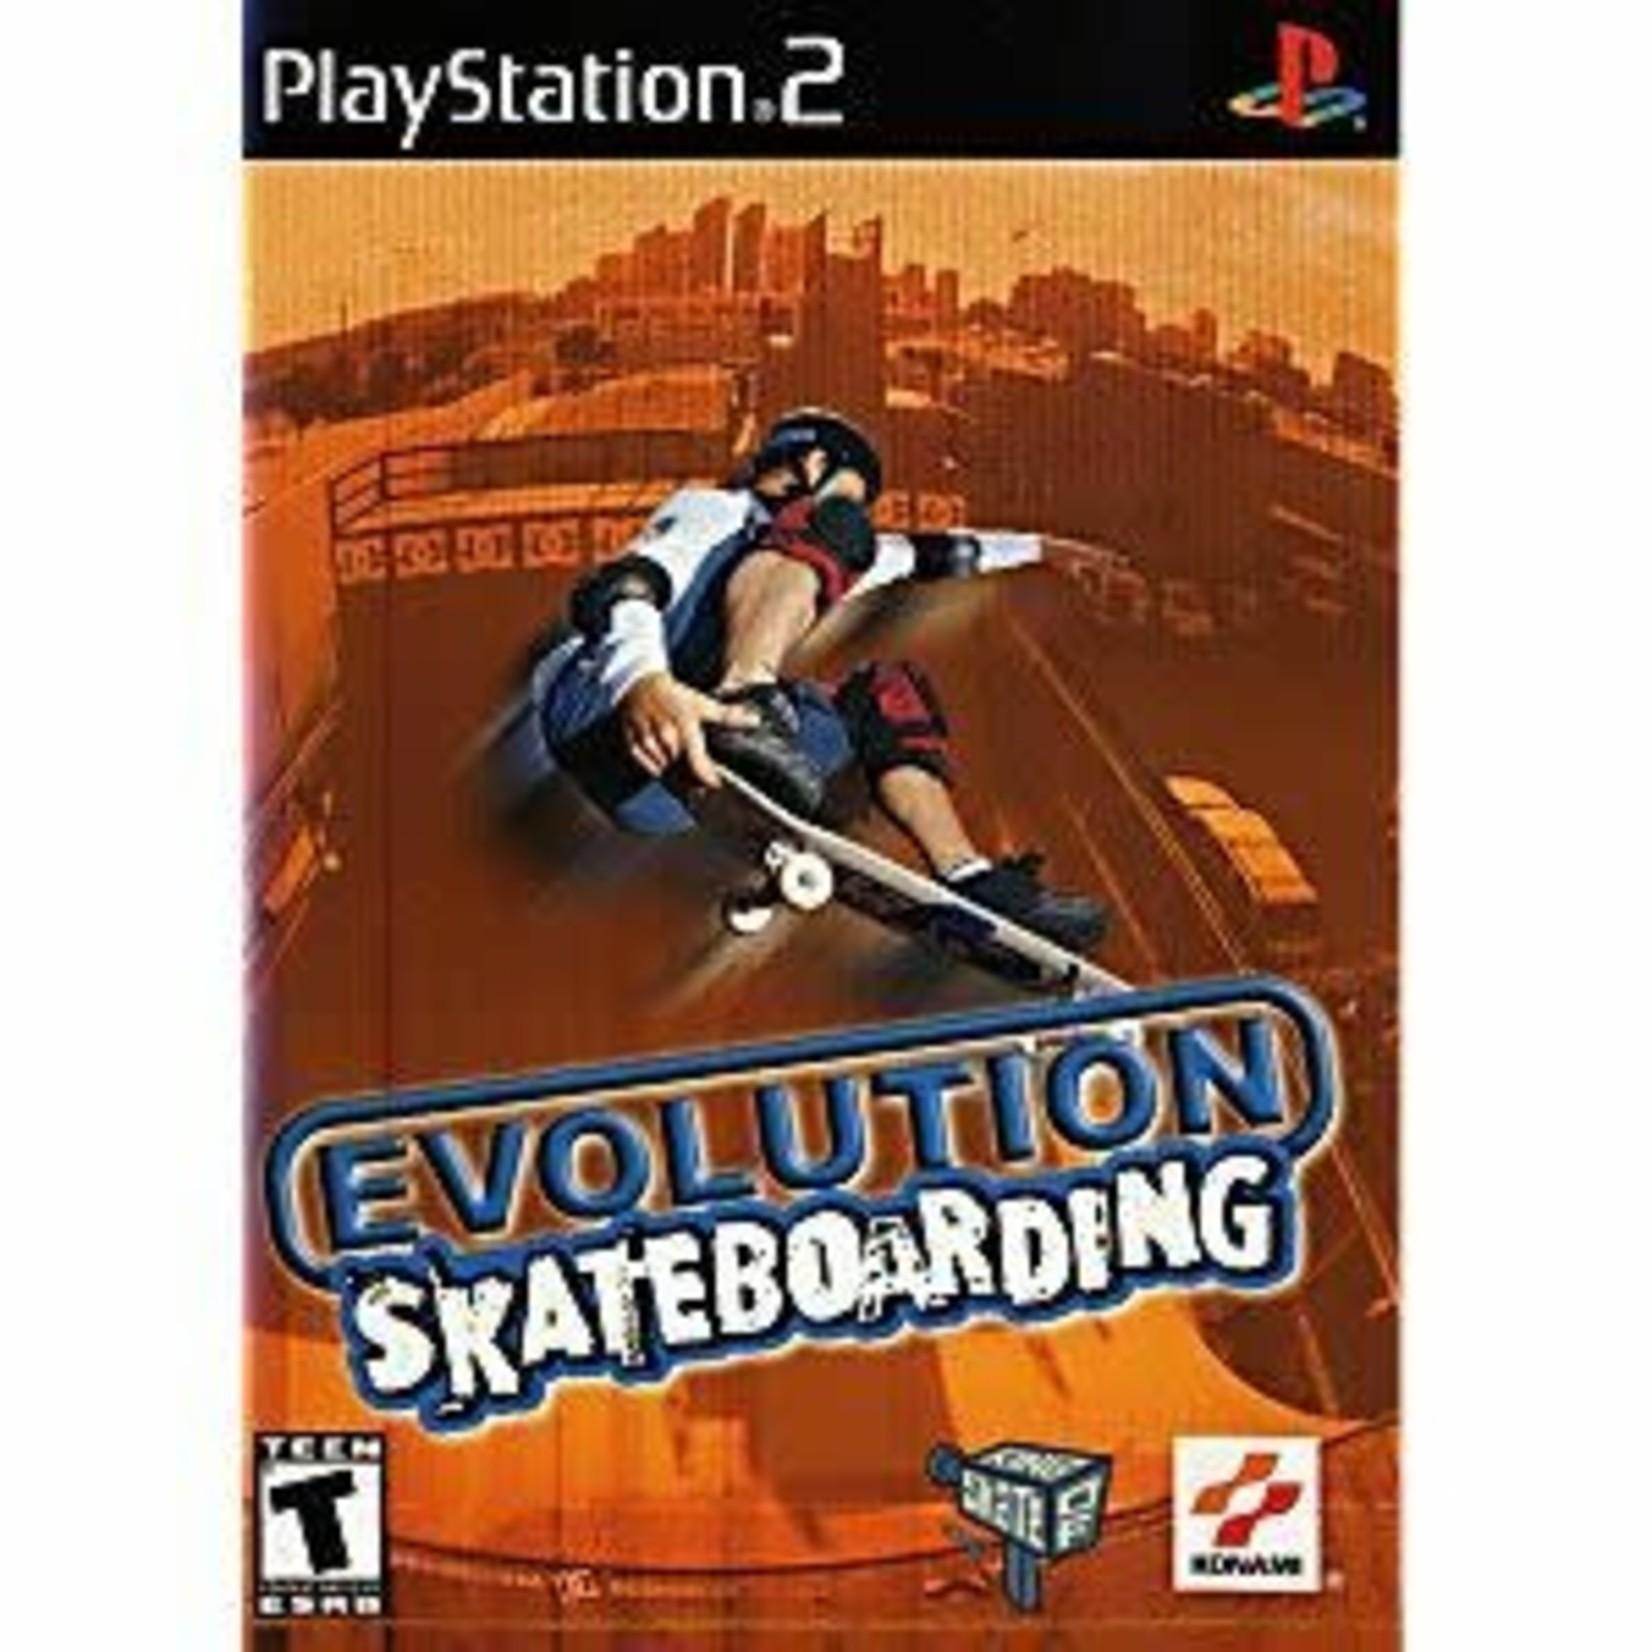 PS2U-Evolution Skateboarding